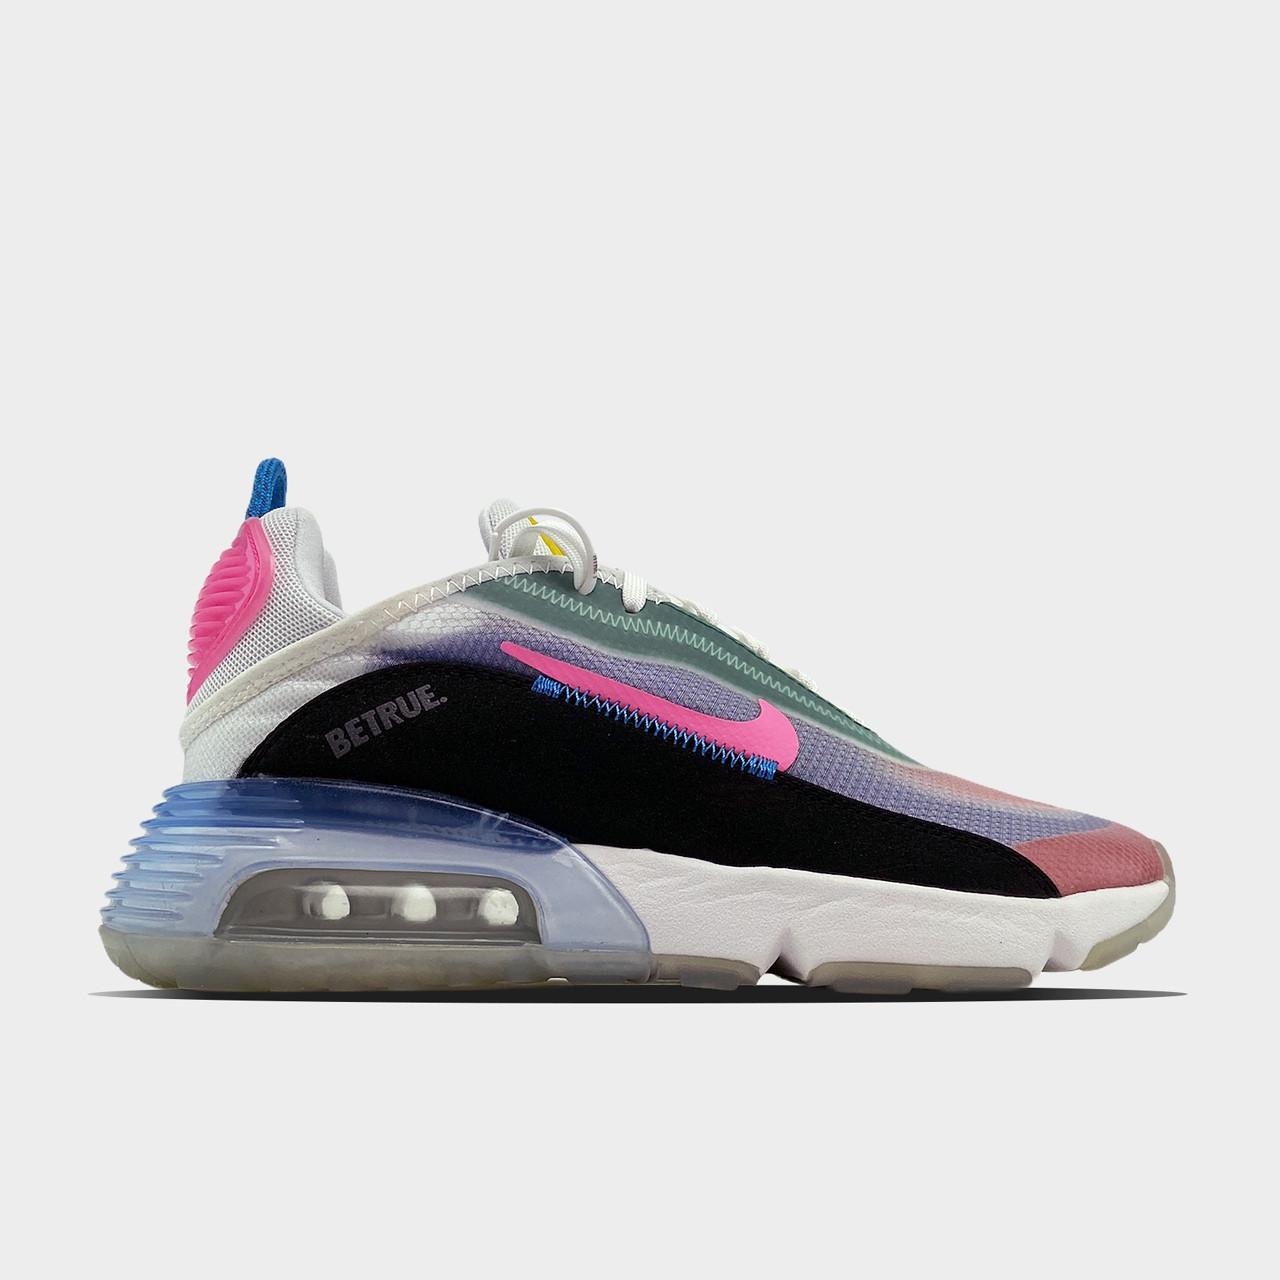 Nk, крос, обувь, взуття, sneakers, шузы, Air Max 2090 White Pink (Розовый)